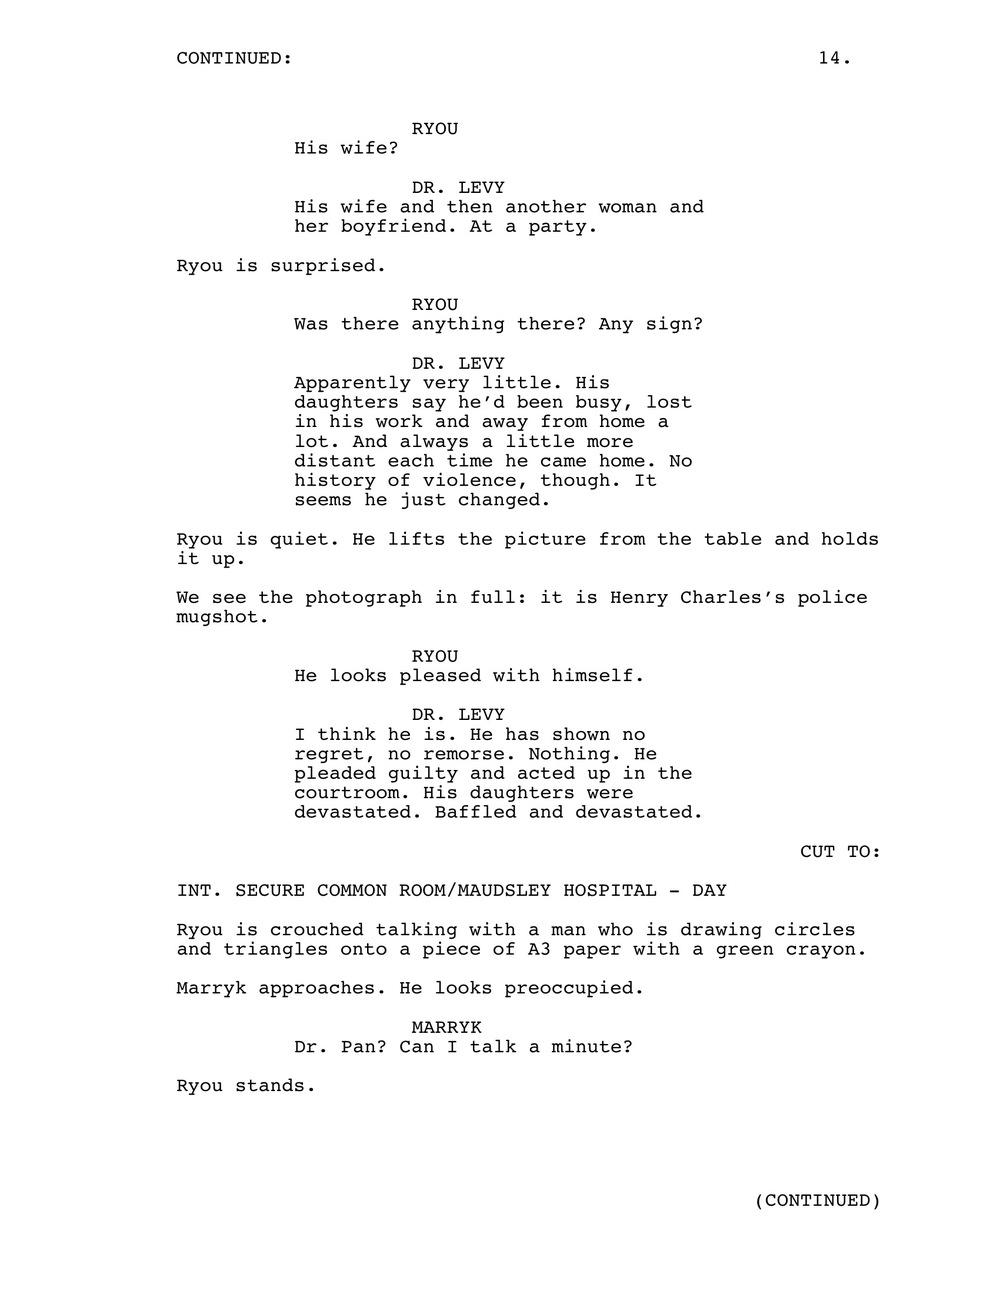 'Introducing Henry Charles' (Pilot) by Alexander Craig | 14.jpeg